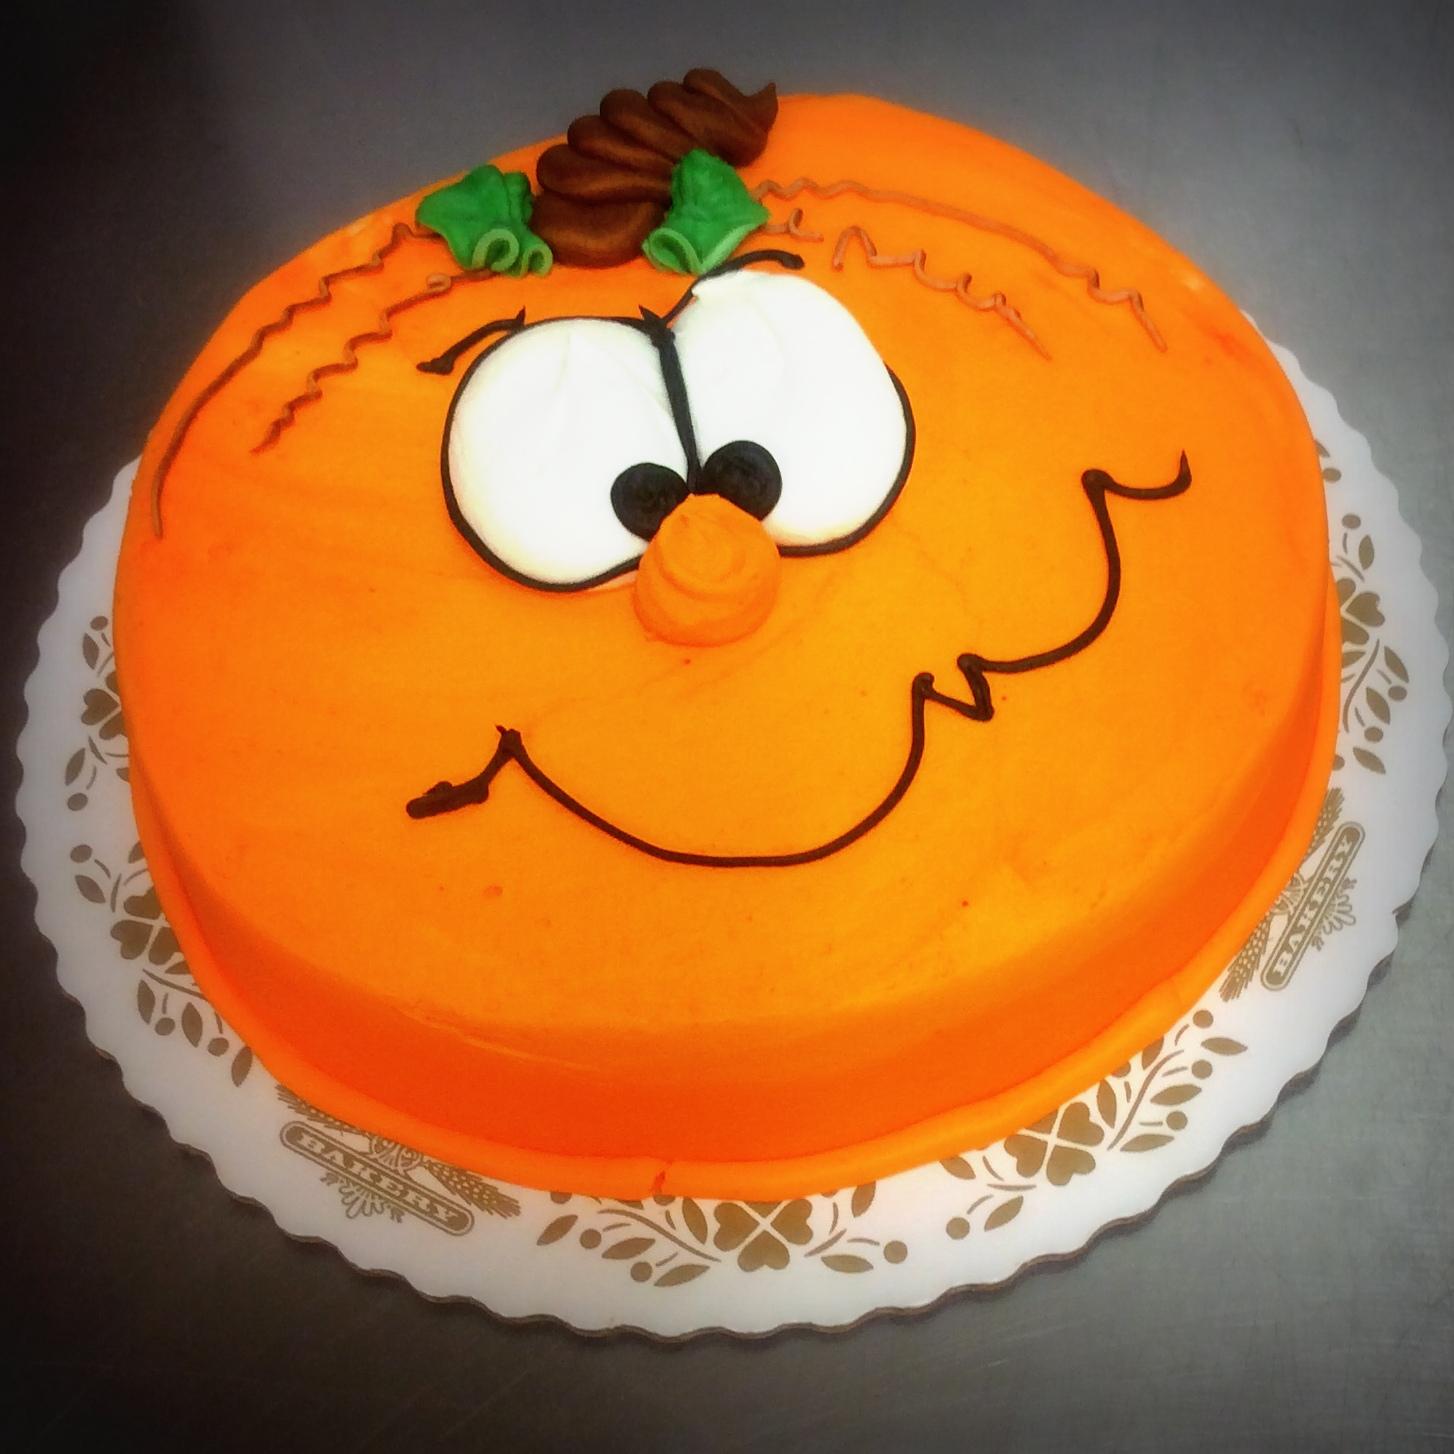 Halloween Round Pumpkin Face Cake